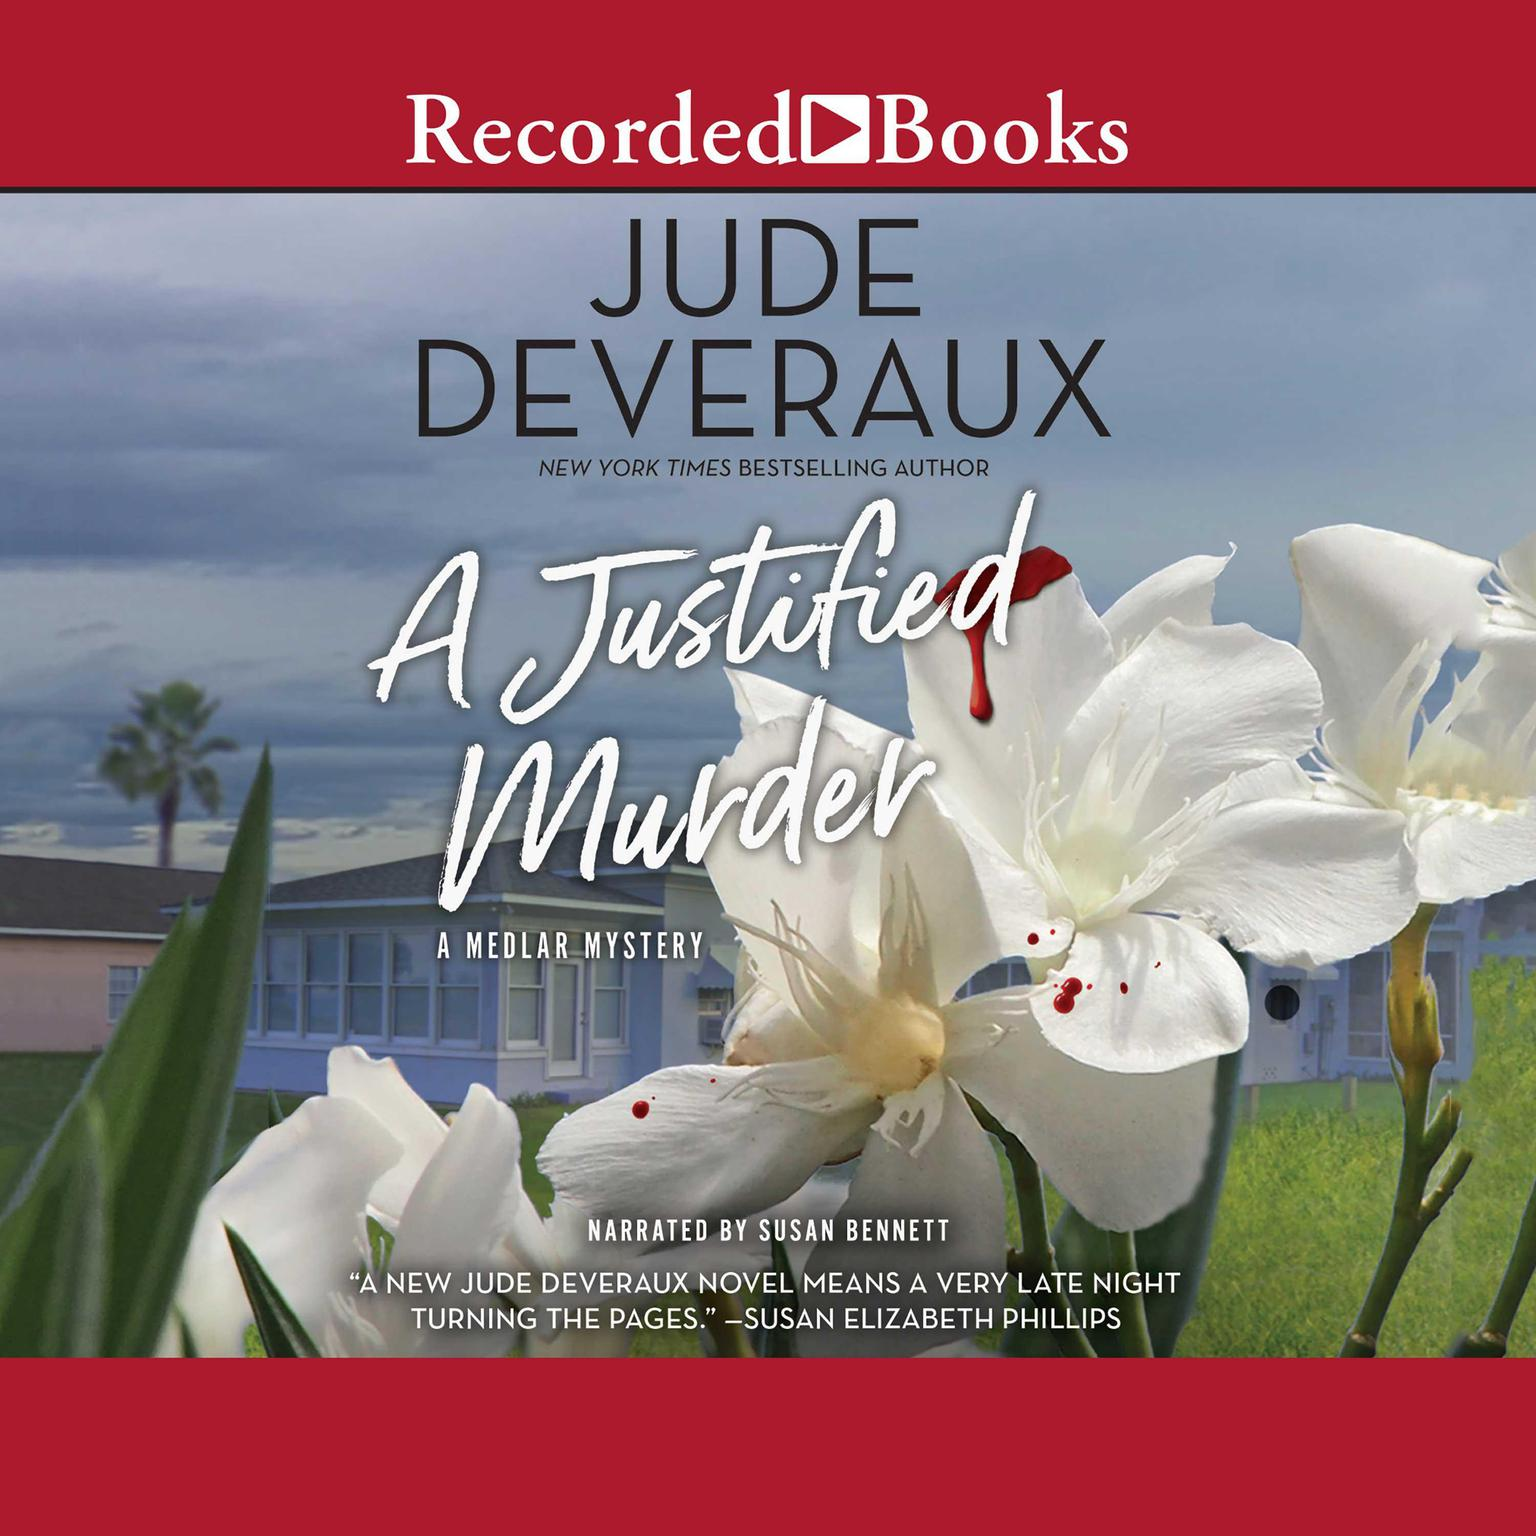 A Justified Murder Audiobook, by Jude Deveraux